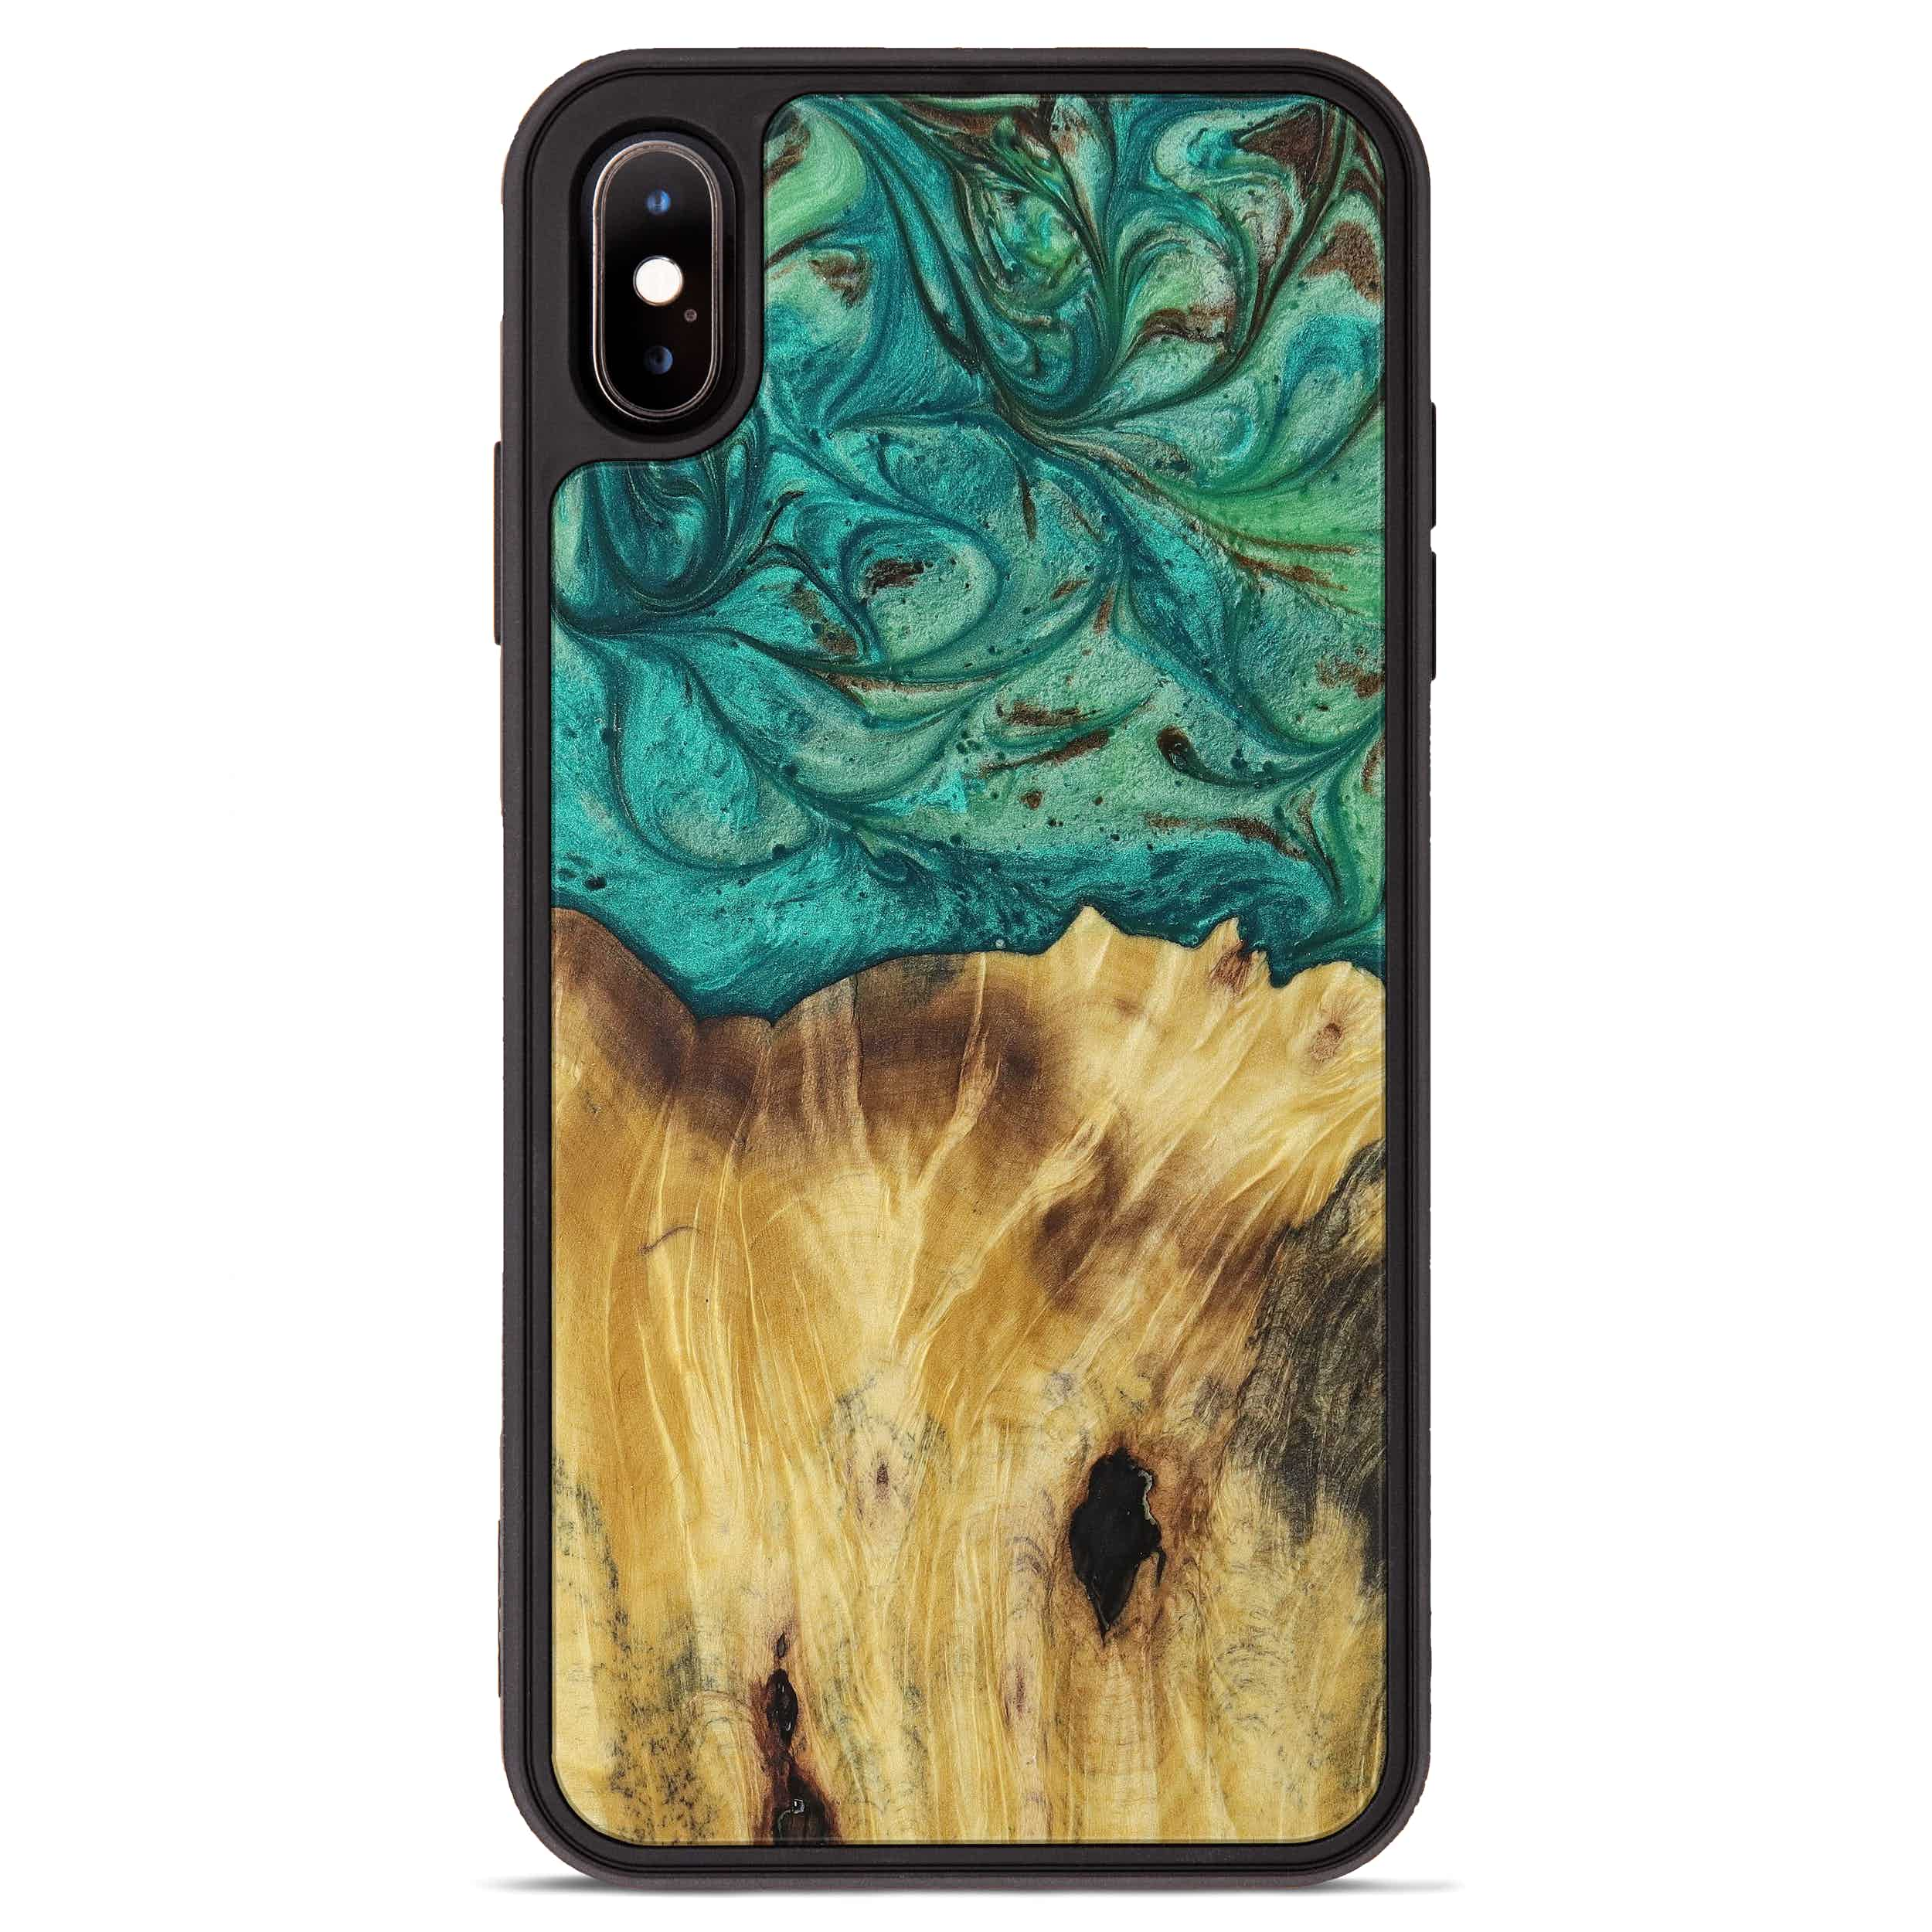 iPhone Xs Max Wood+Resin Phone Case - Tom (Dark Green, 397789)